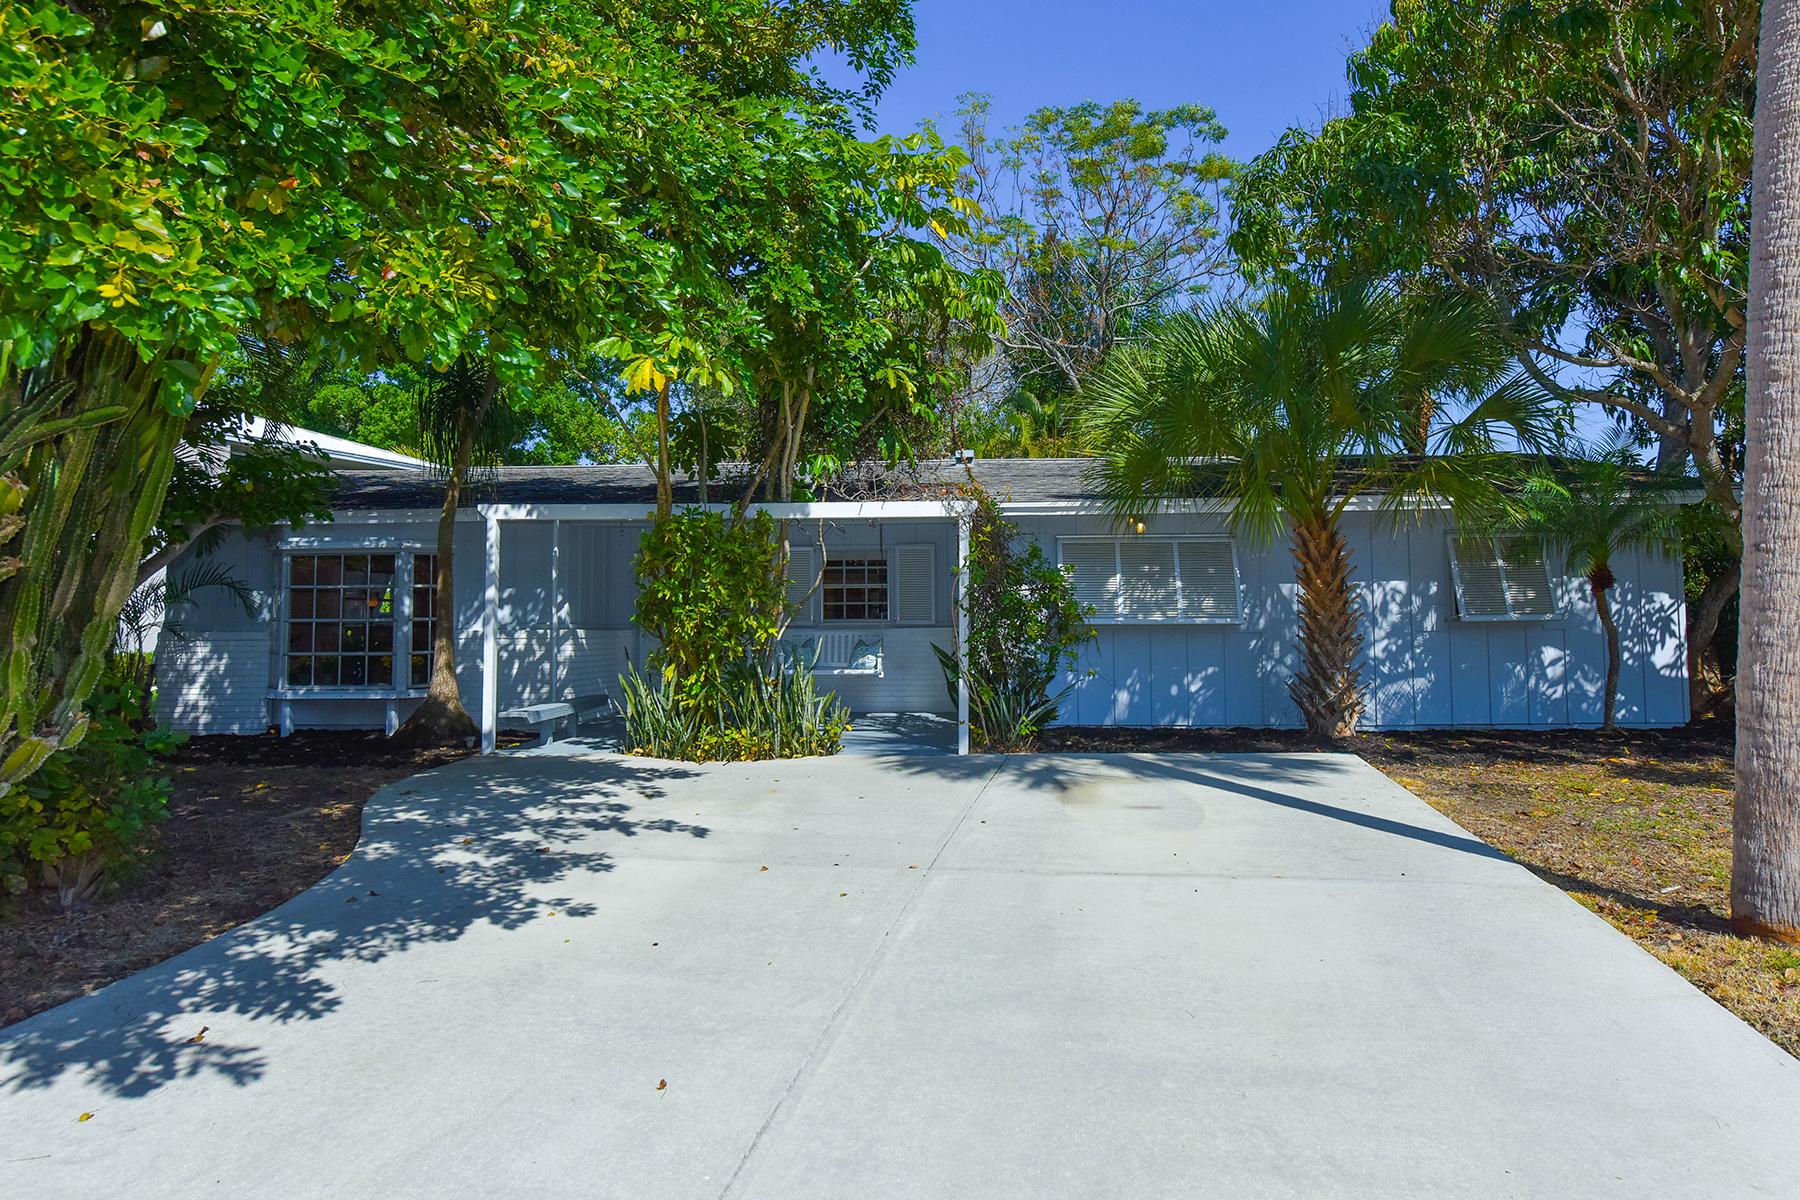 Single Family Home for Sale at SIESTA KEY 539 Avenida Del Norte Sarasota, Florida, 34242 United States